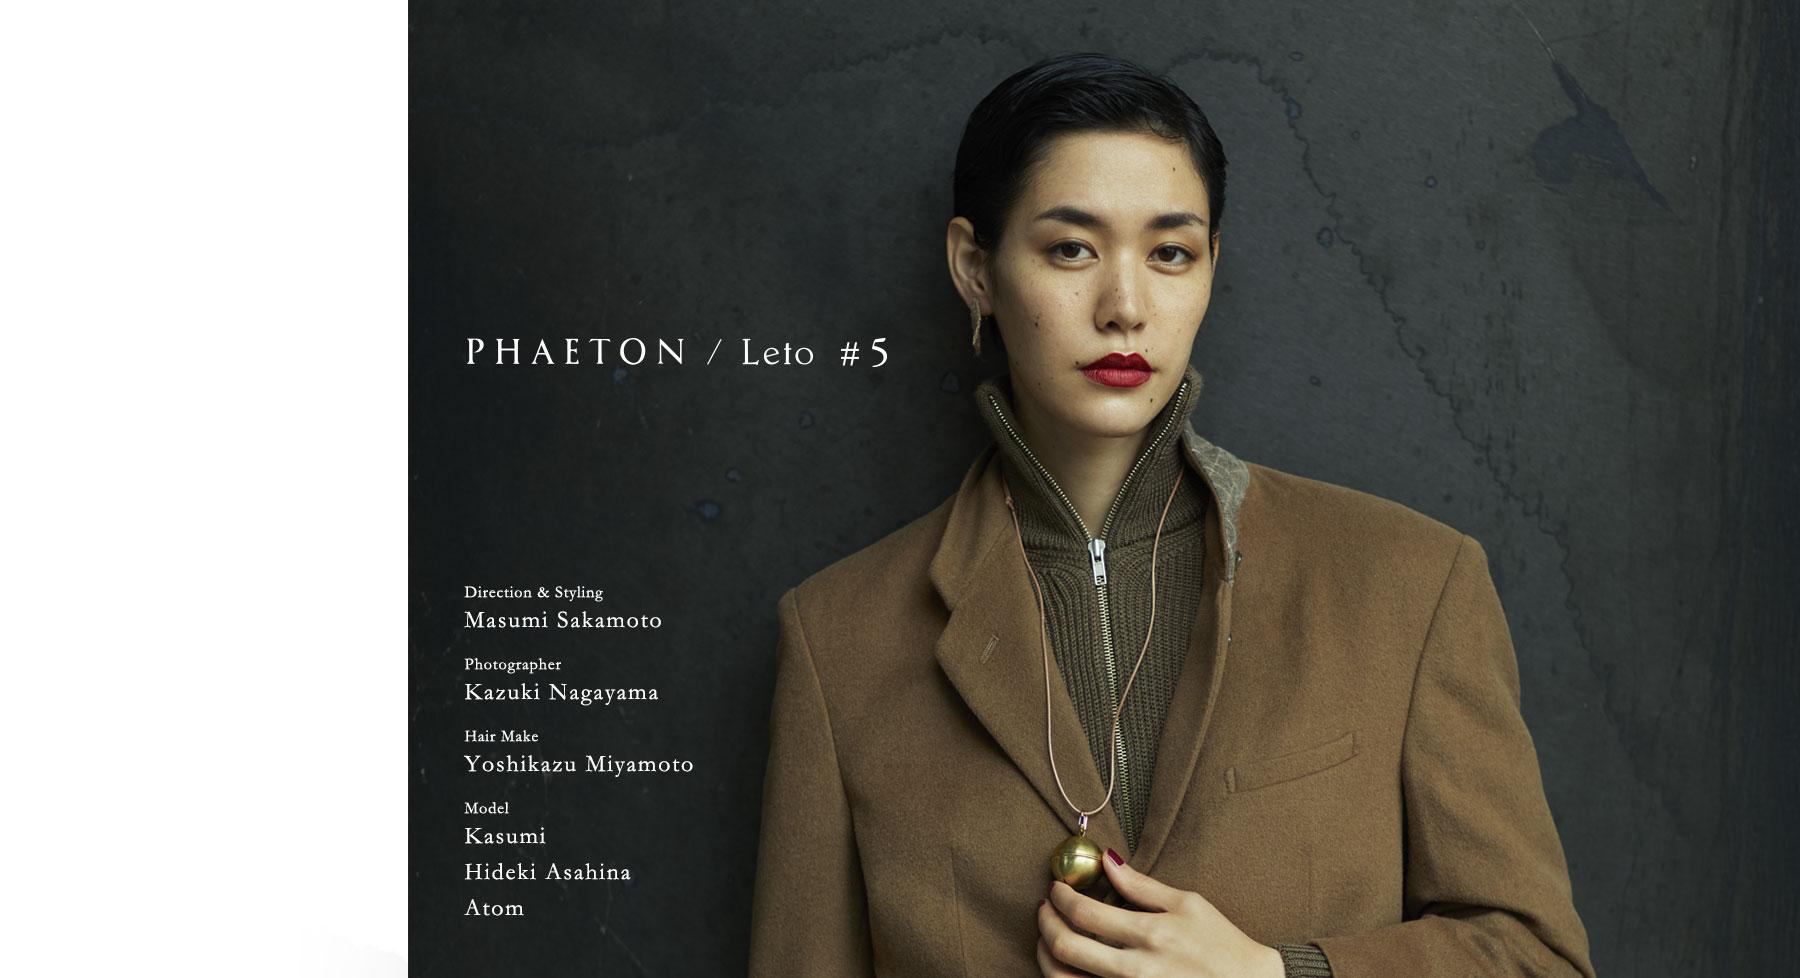 PHAETON BOOK #5